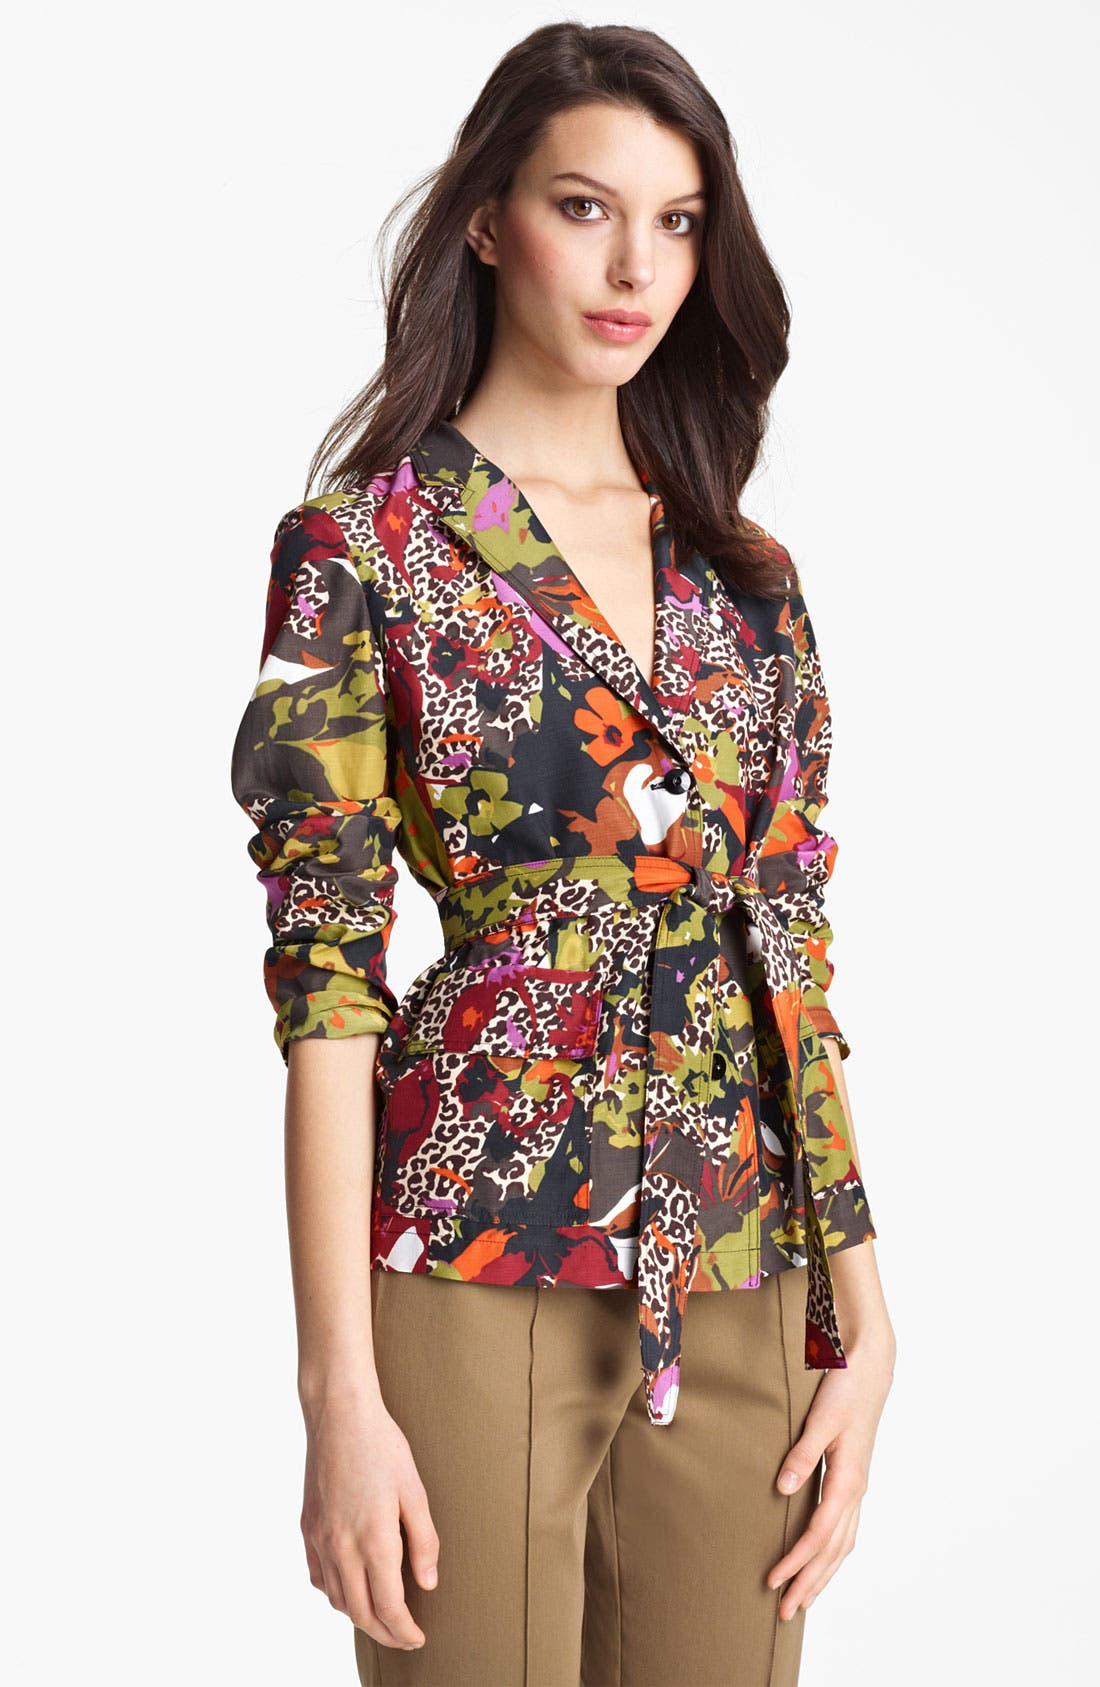 Alternate Image 1 Selected - Max Mara Belted Floral Print Jacket